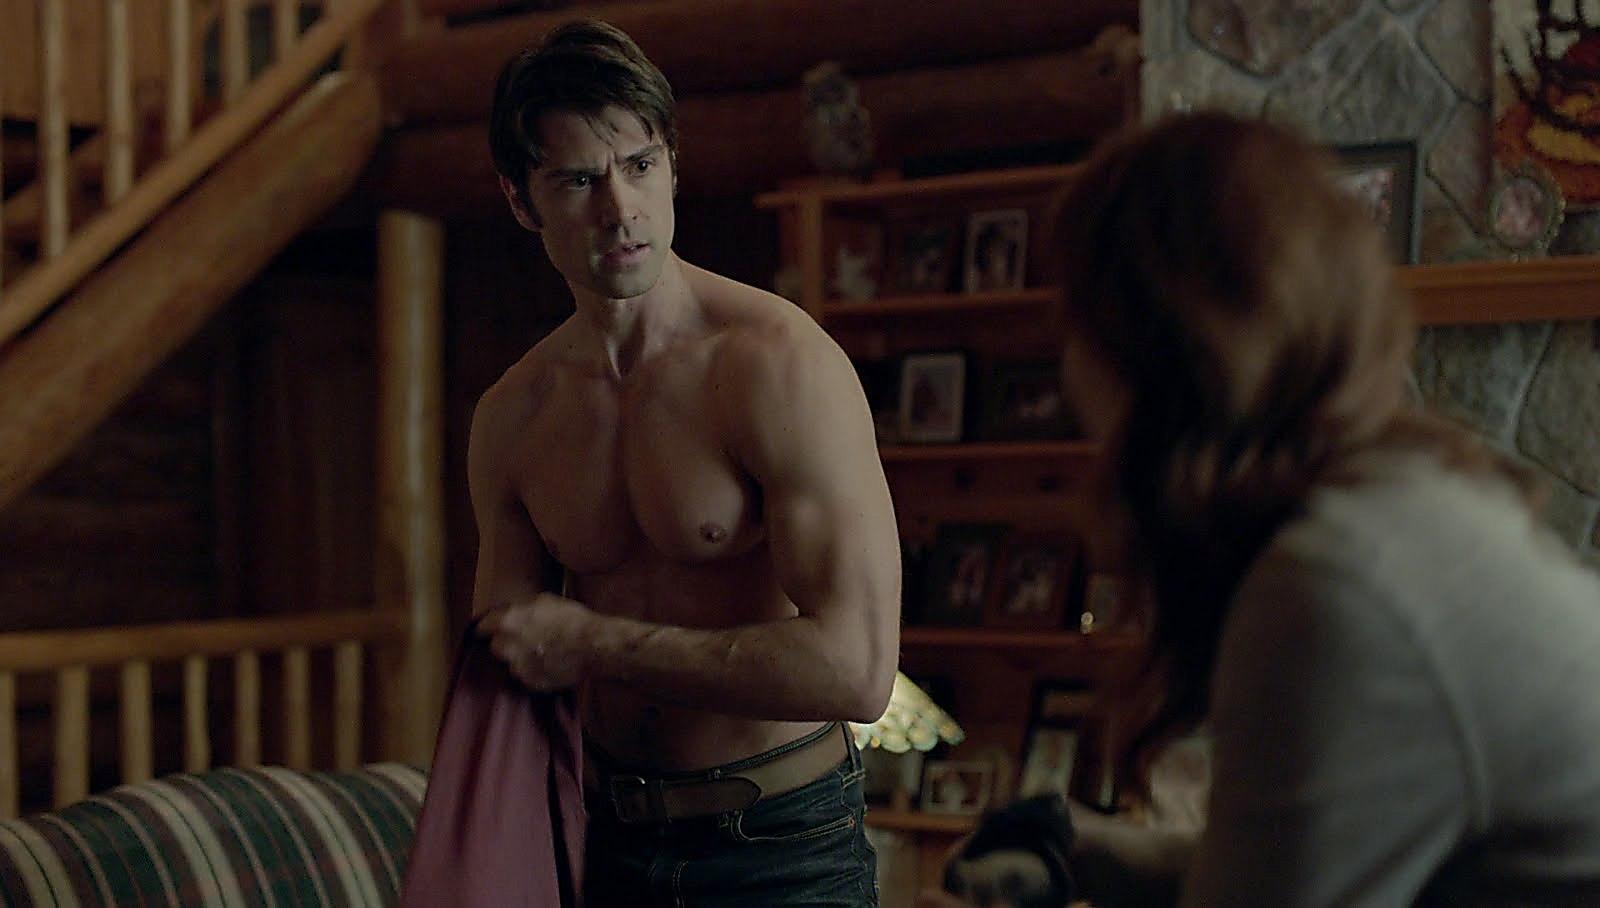 Corey Sevier sexy shirtless scene July 7, 2018, 11am